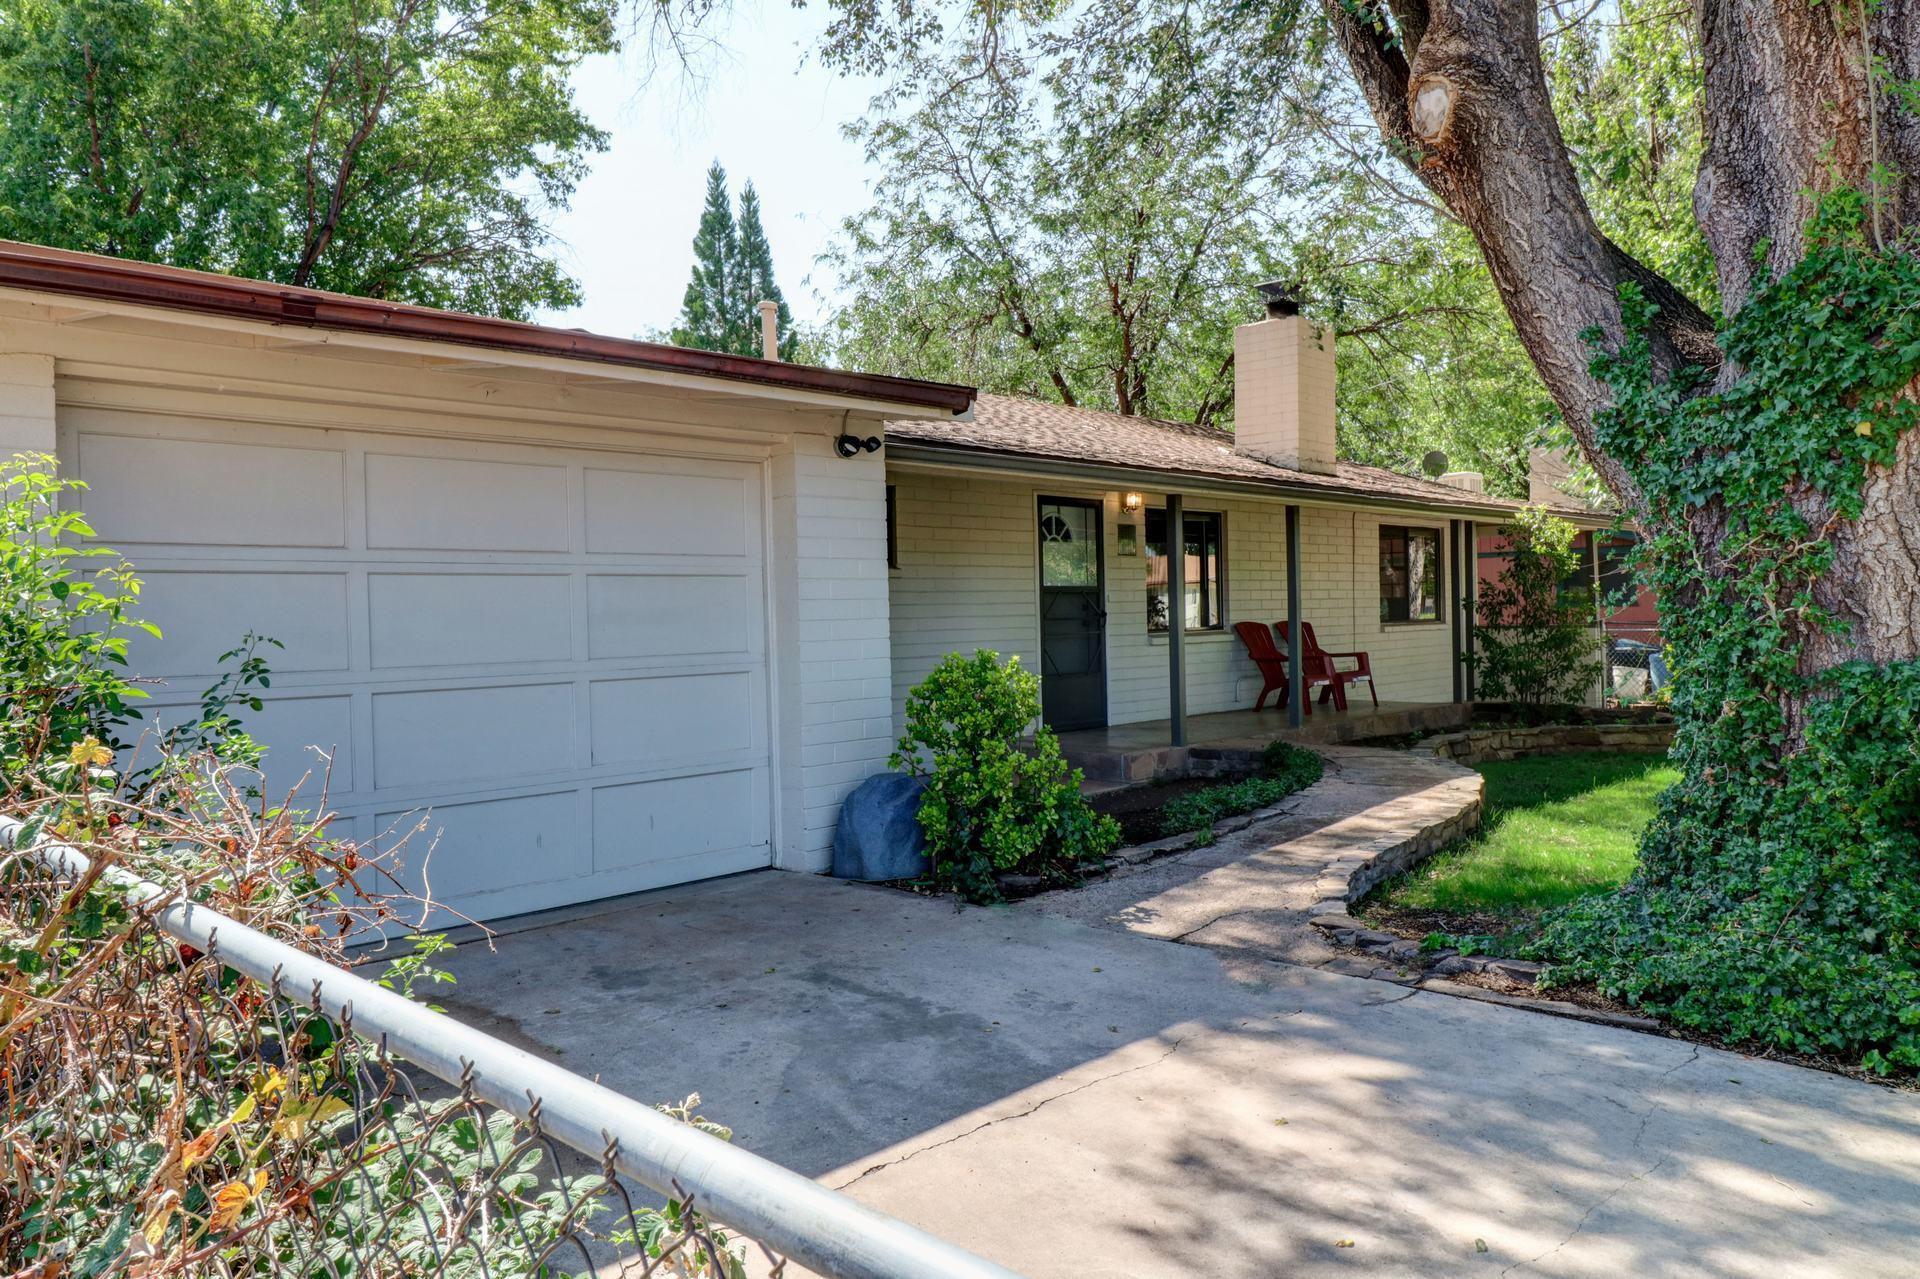 89 N Milky Way, Star Valley, AZ 85541 - 2 Bed, 1 75 Bath Single-Family Home  - MLS #78837 - 27 Photos | Trulia